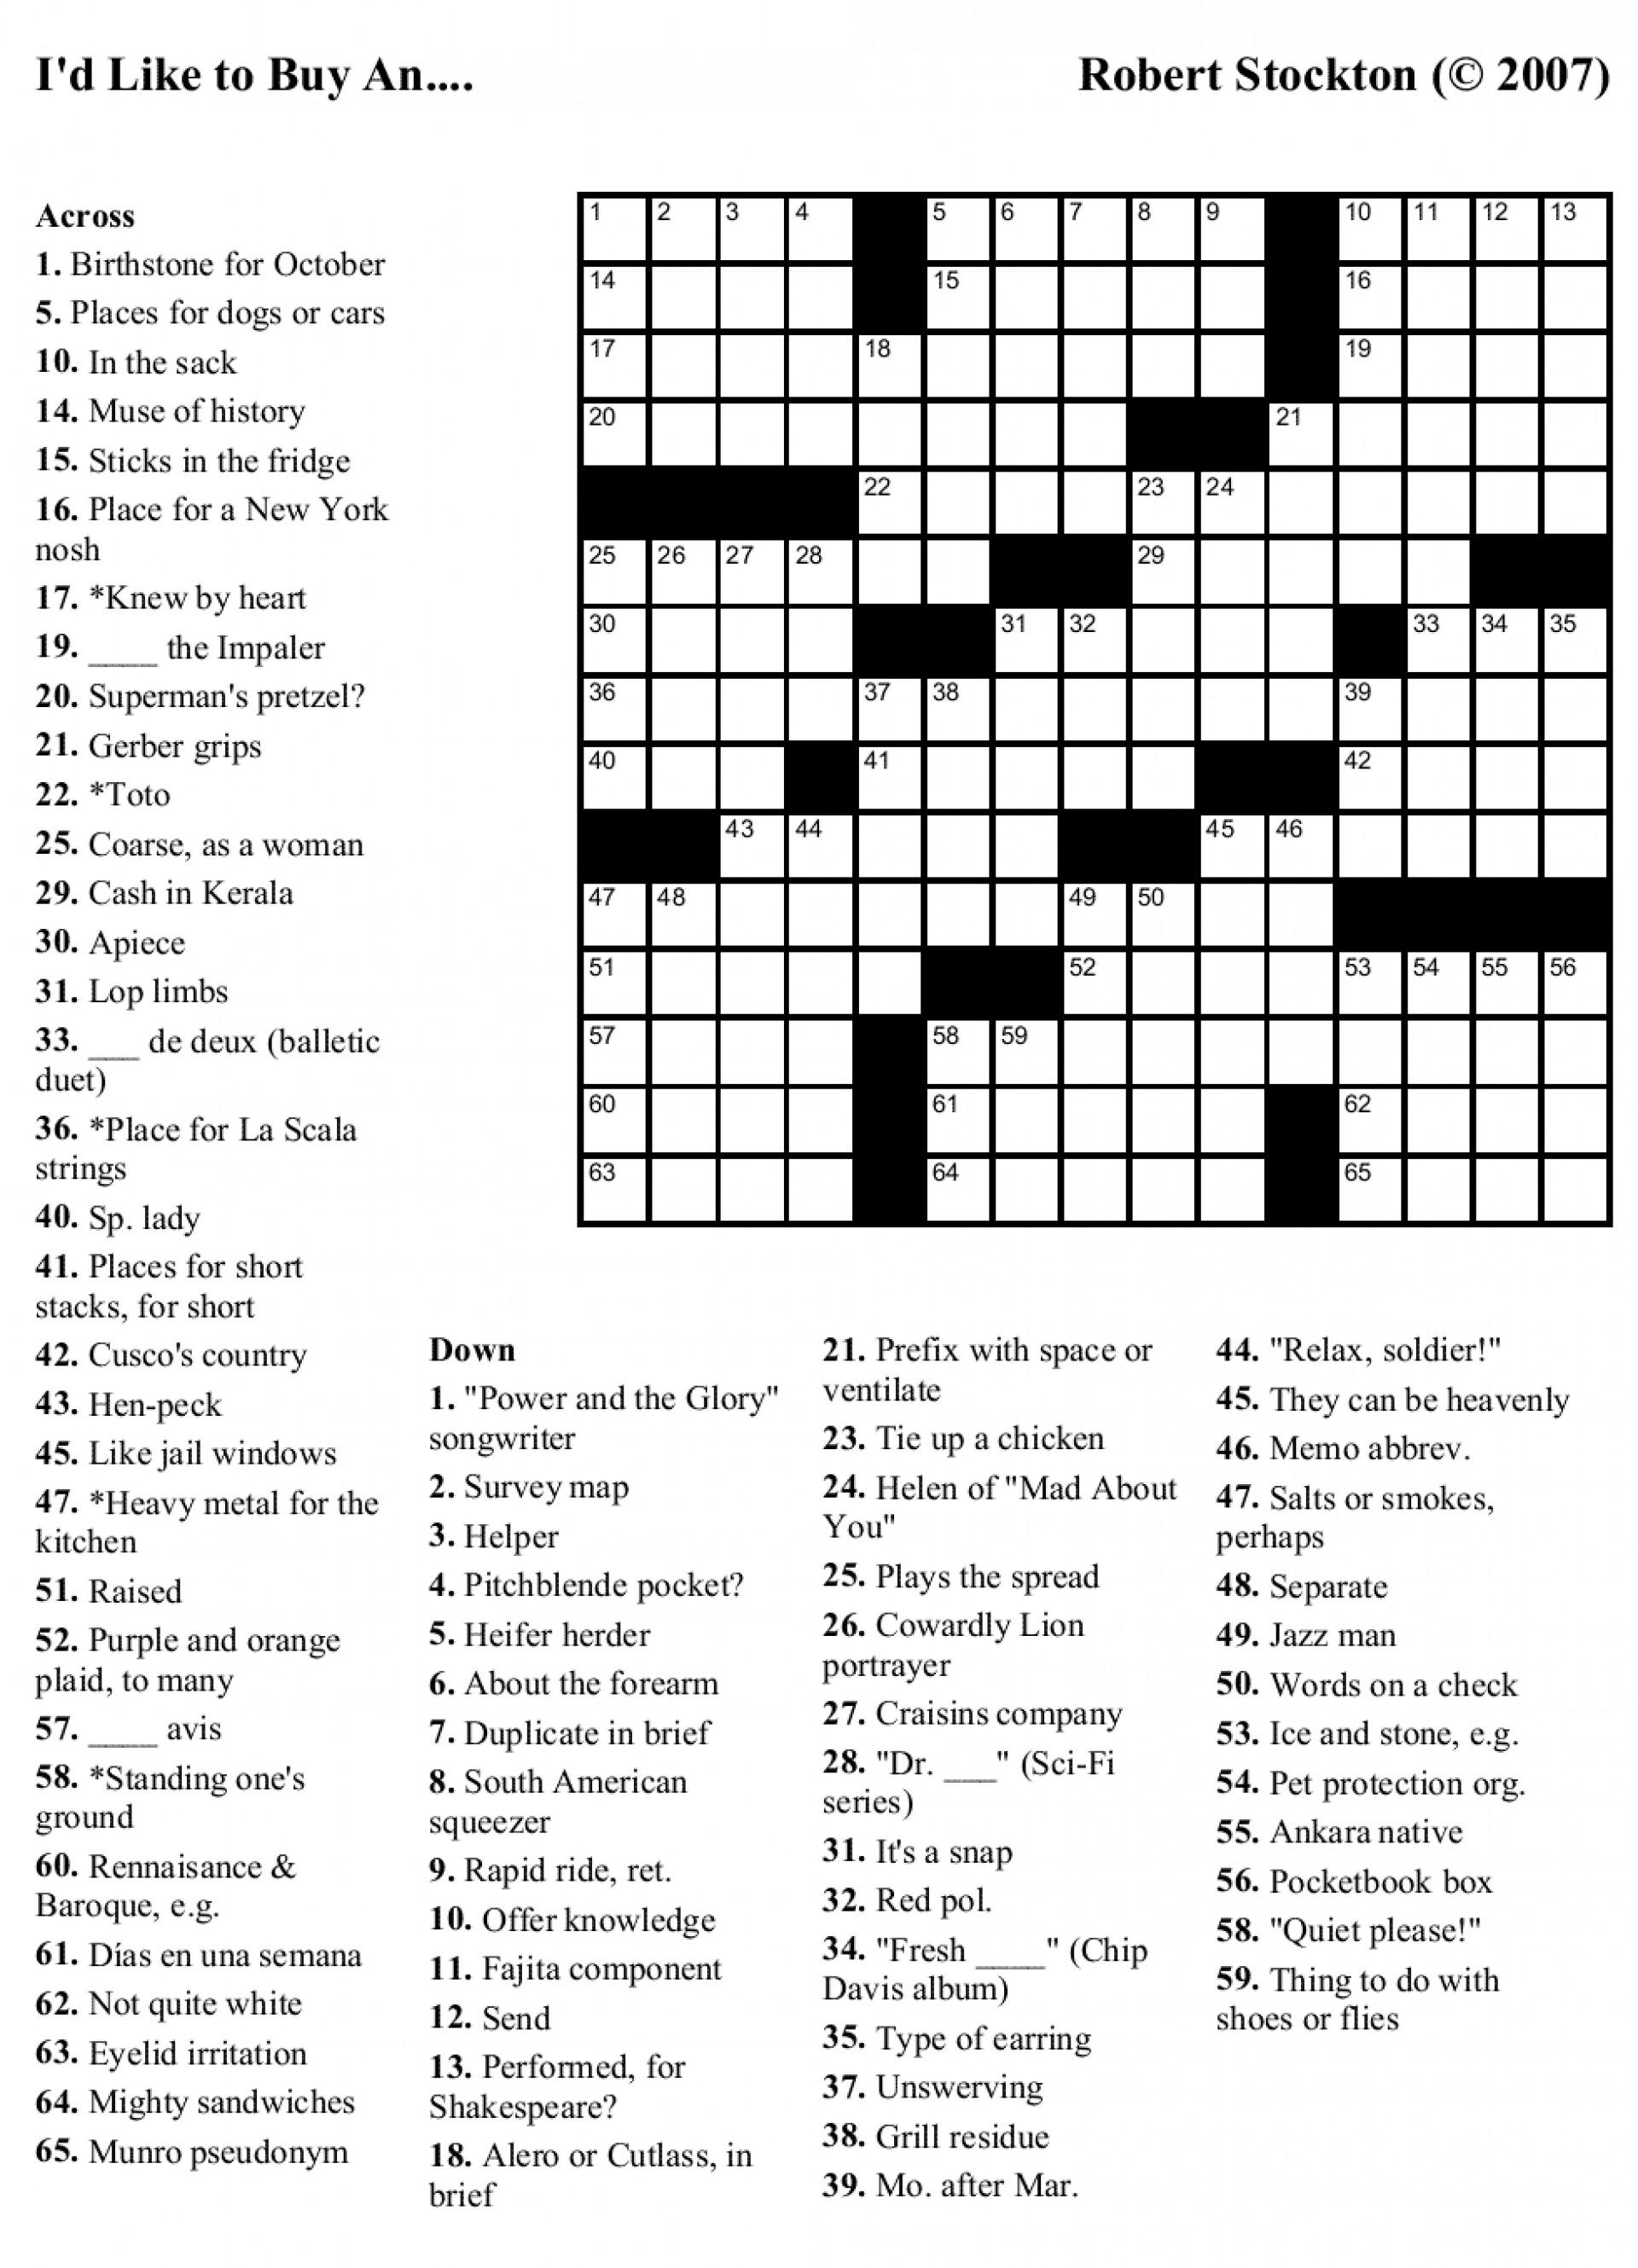 Crossword Puzzle Maker Online Free Printable Crosswords Jigsaw - Jigsaw Puzzle Maker Free Online Printable